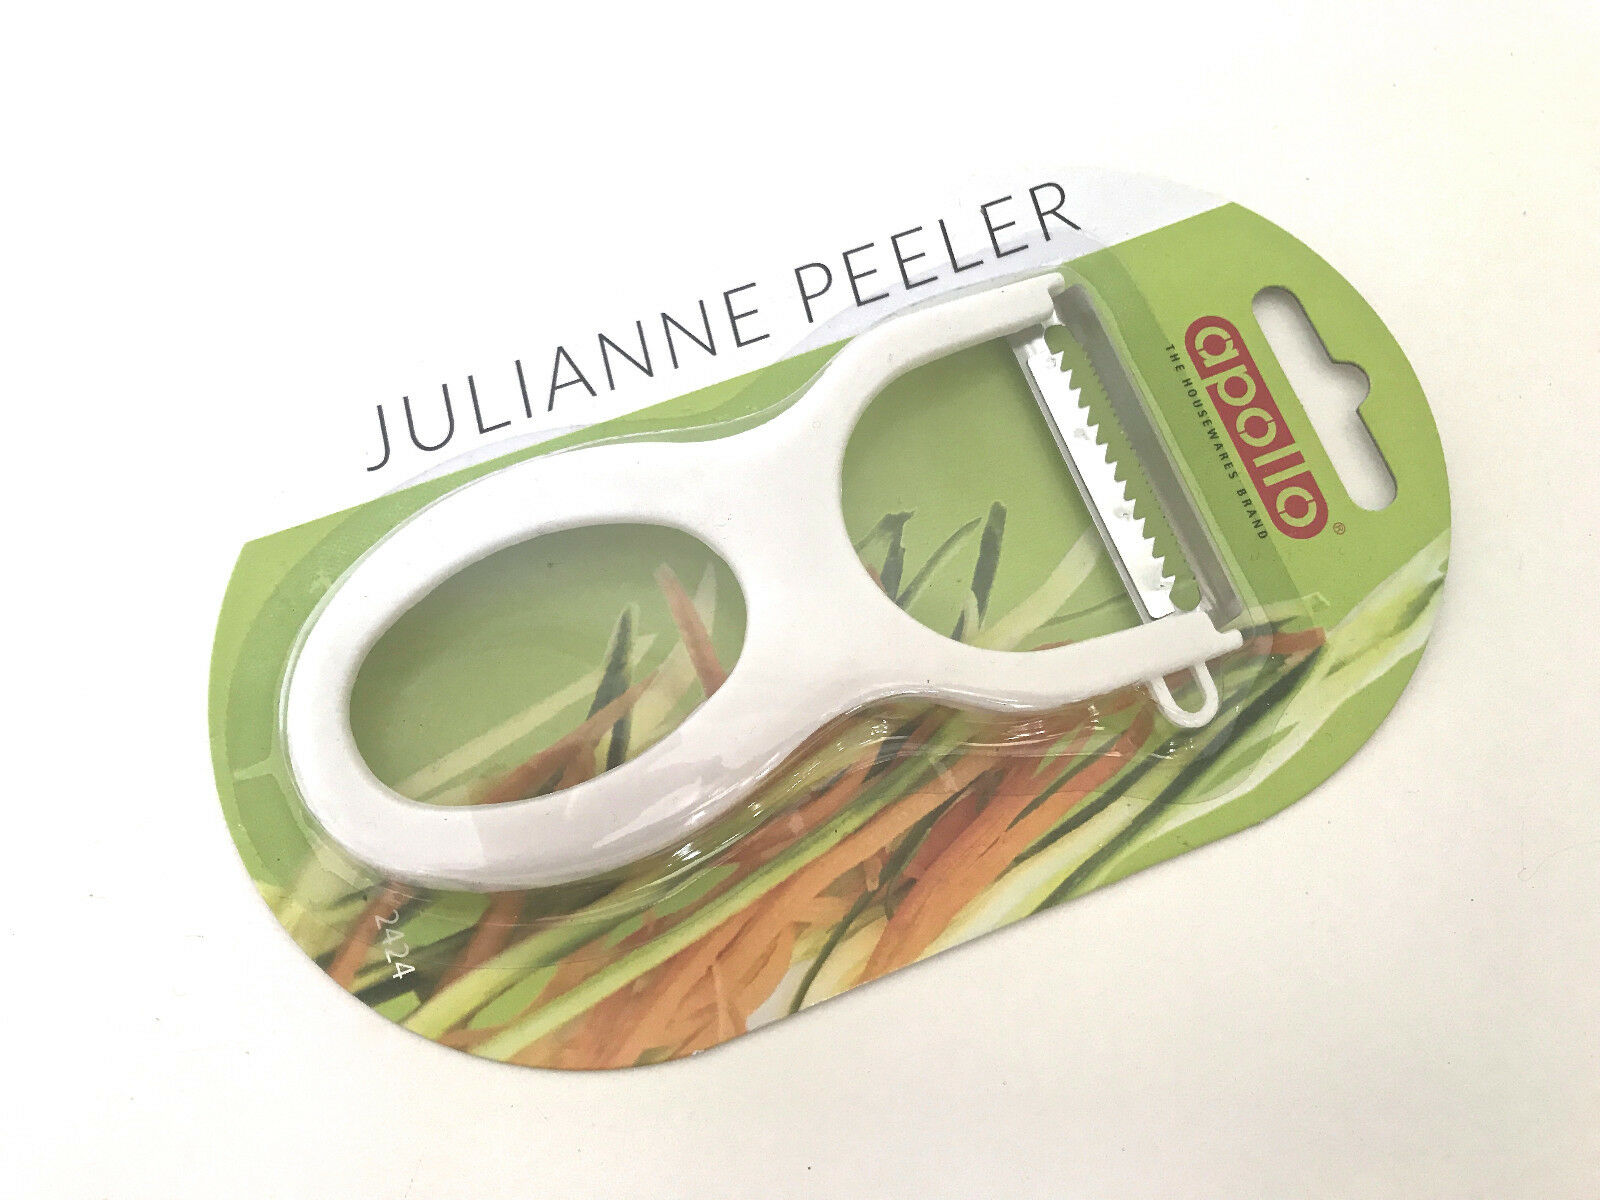 NEW Julienne Vegetable Peeler Speed Stainless Steel Blade Coleslaw Slicer Fruit